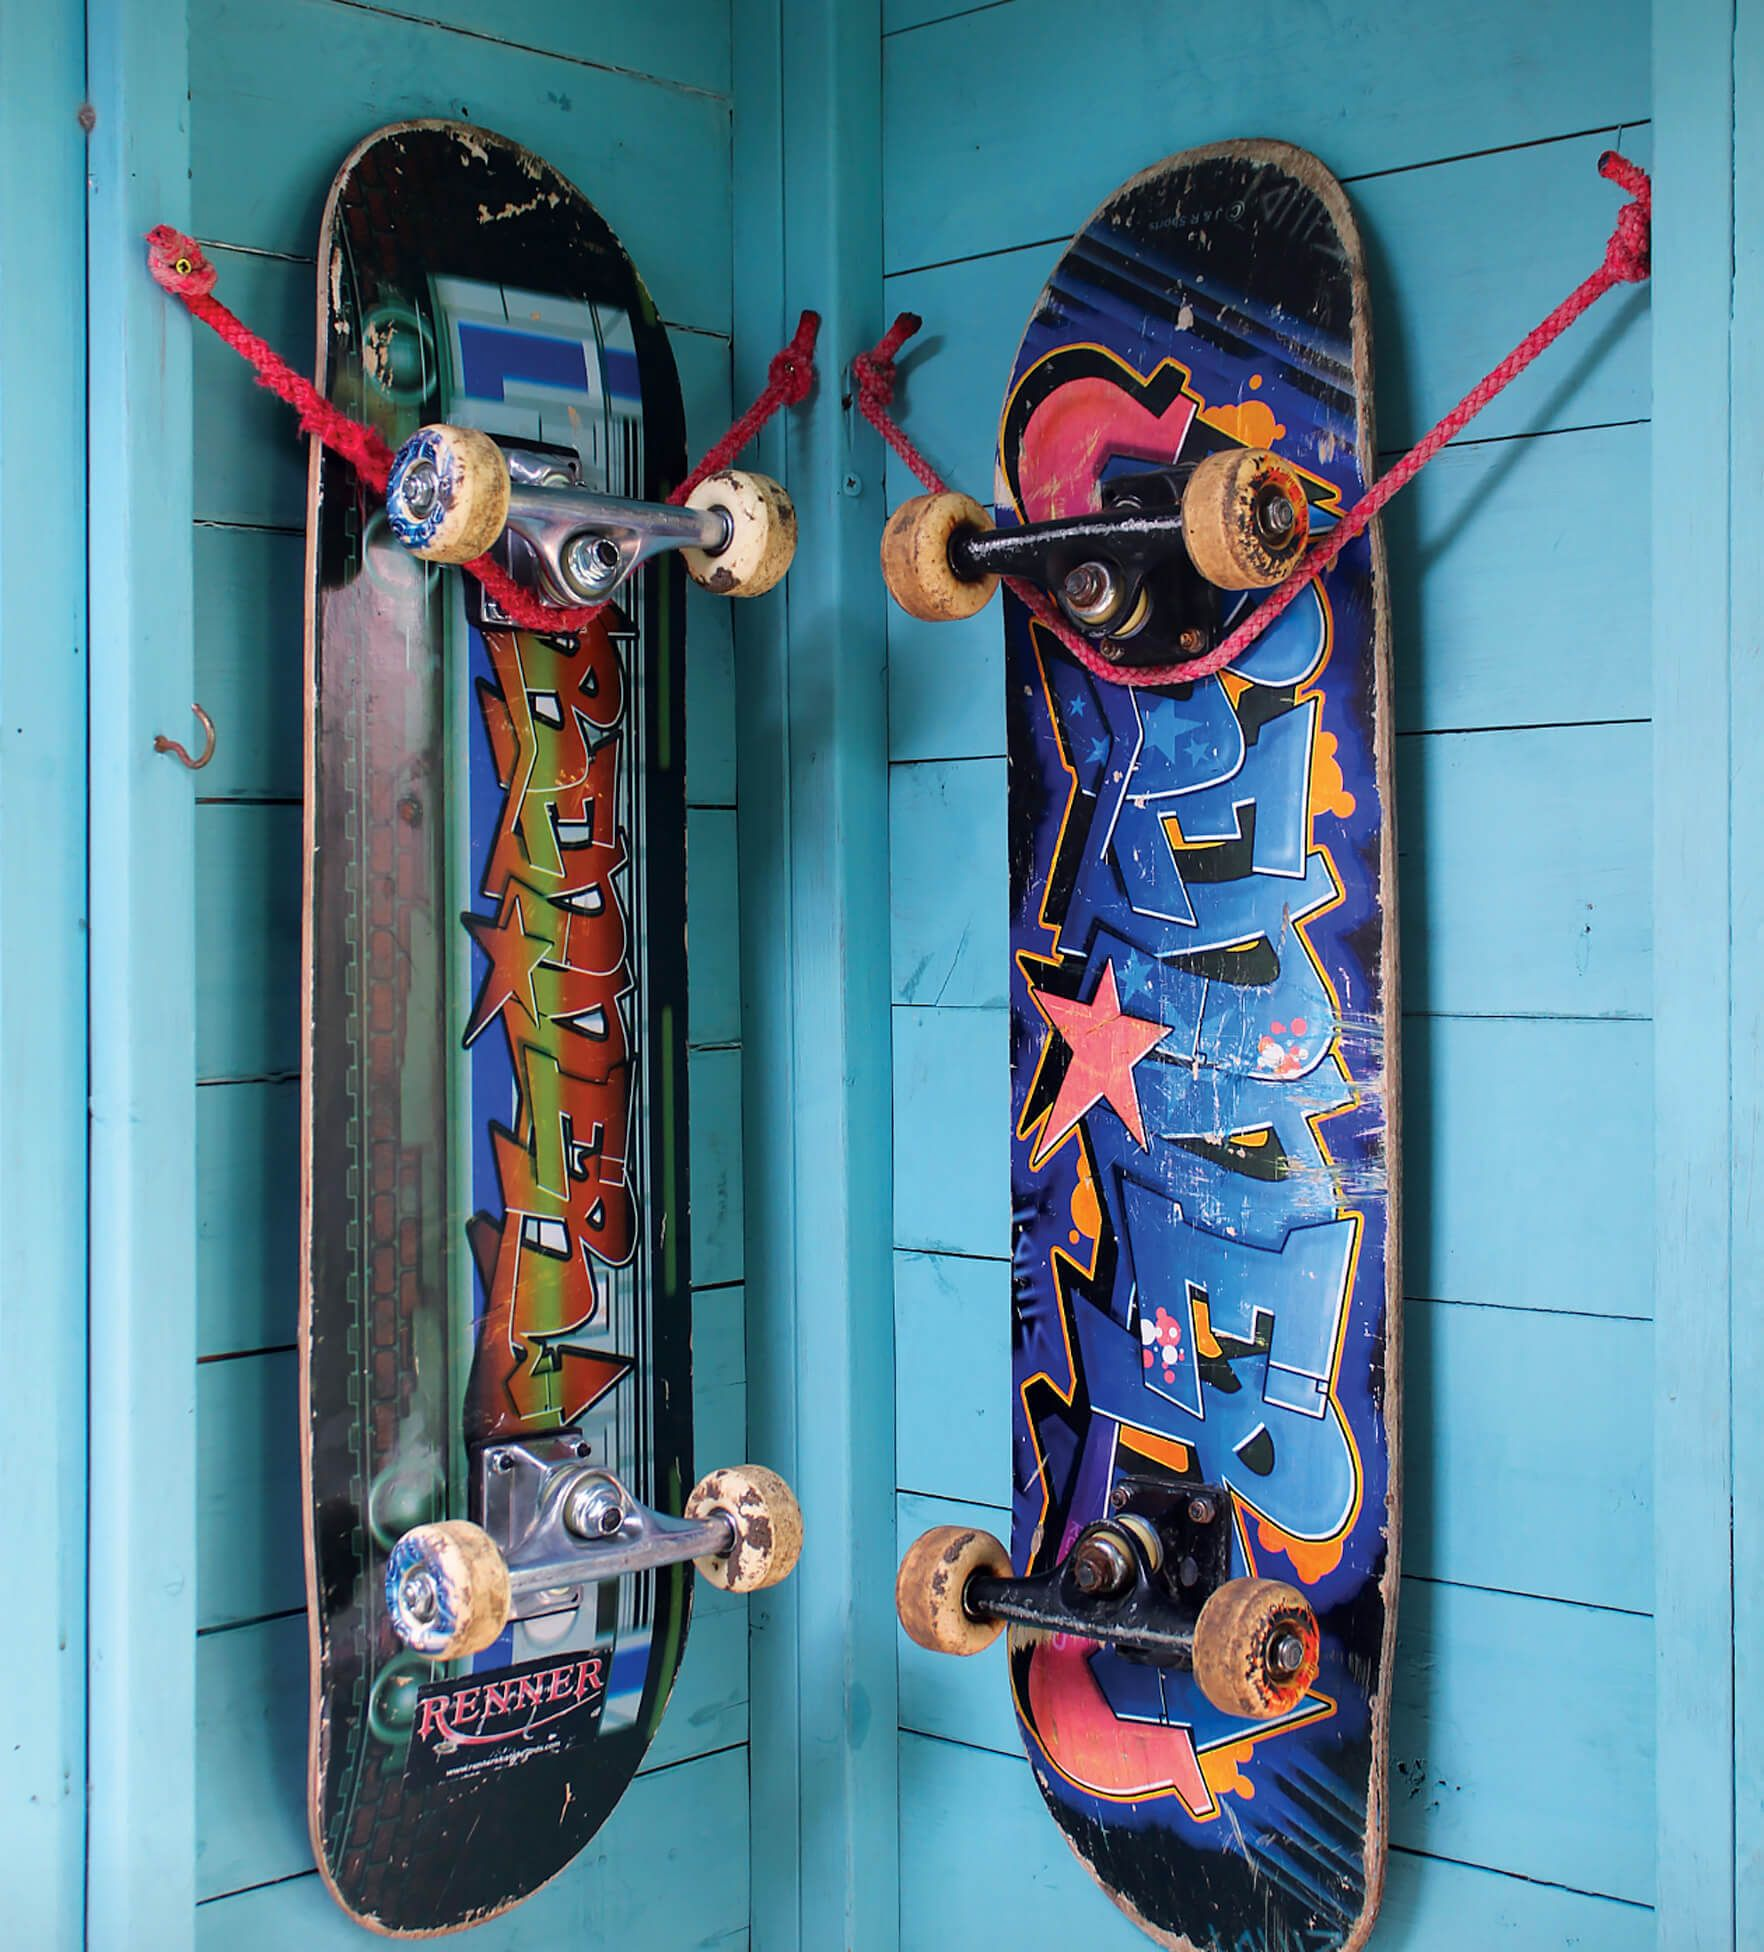 Skate Decor An Insanely Easy Way To Mount A Skateboard On A Wall Skateboard Room Skateboard Display Skateboard Storage